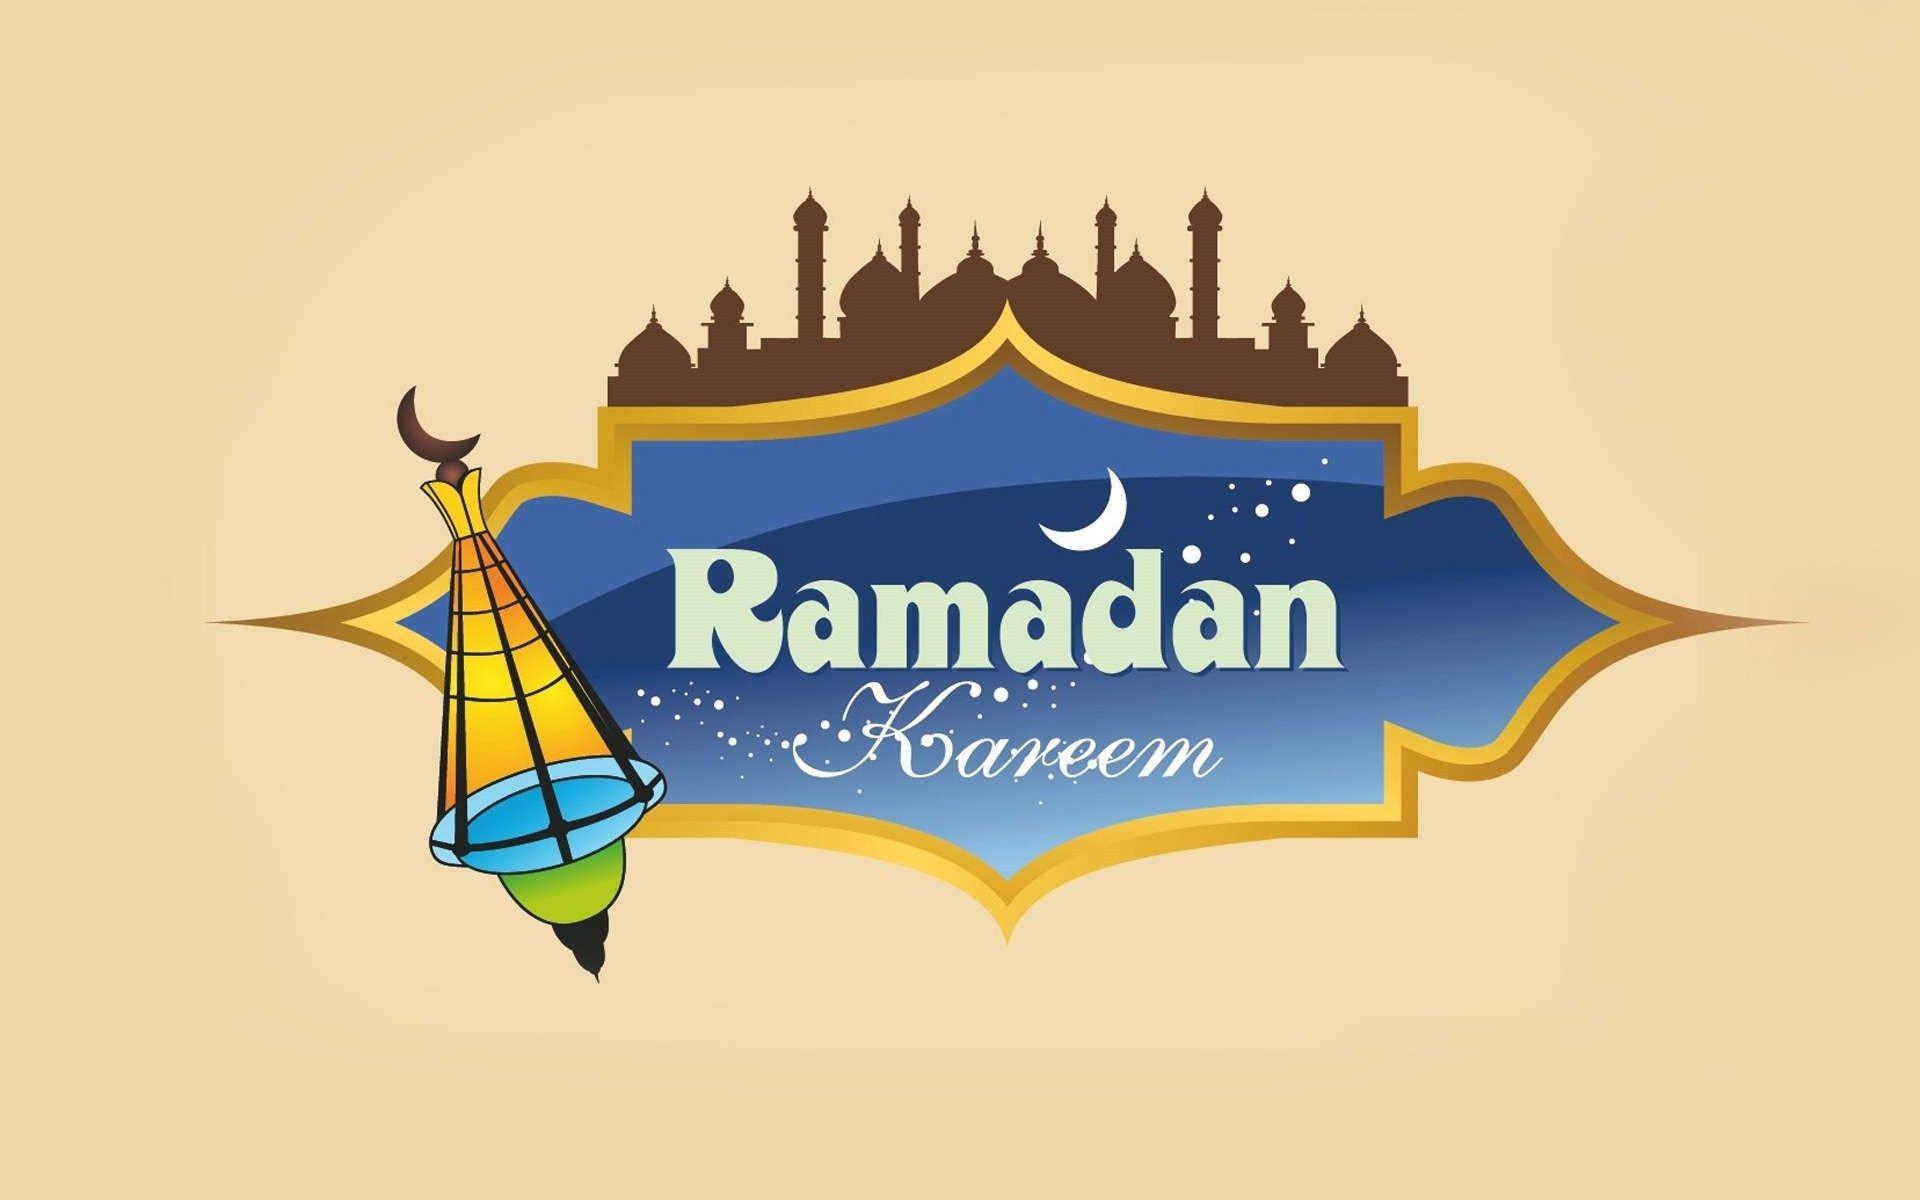 Ramadan Mubarak 2019 collection is now available here Also you can Ramadan Mubarak wallpapers 2019 As the Ramadan Mubarak 2019 has e on